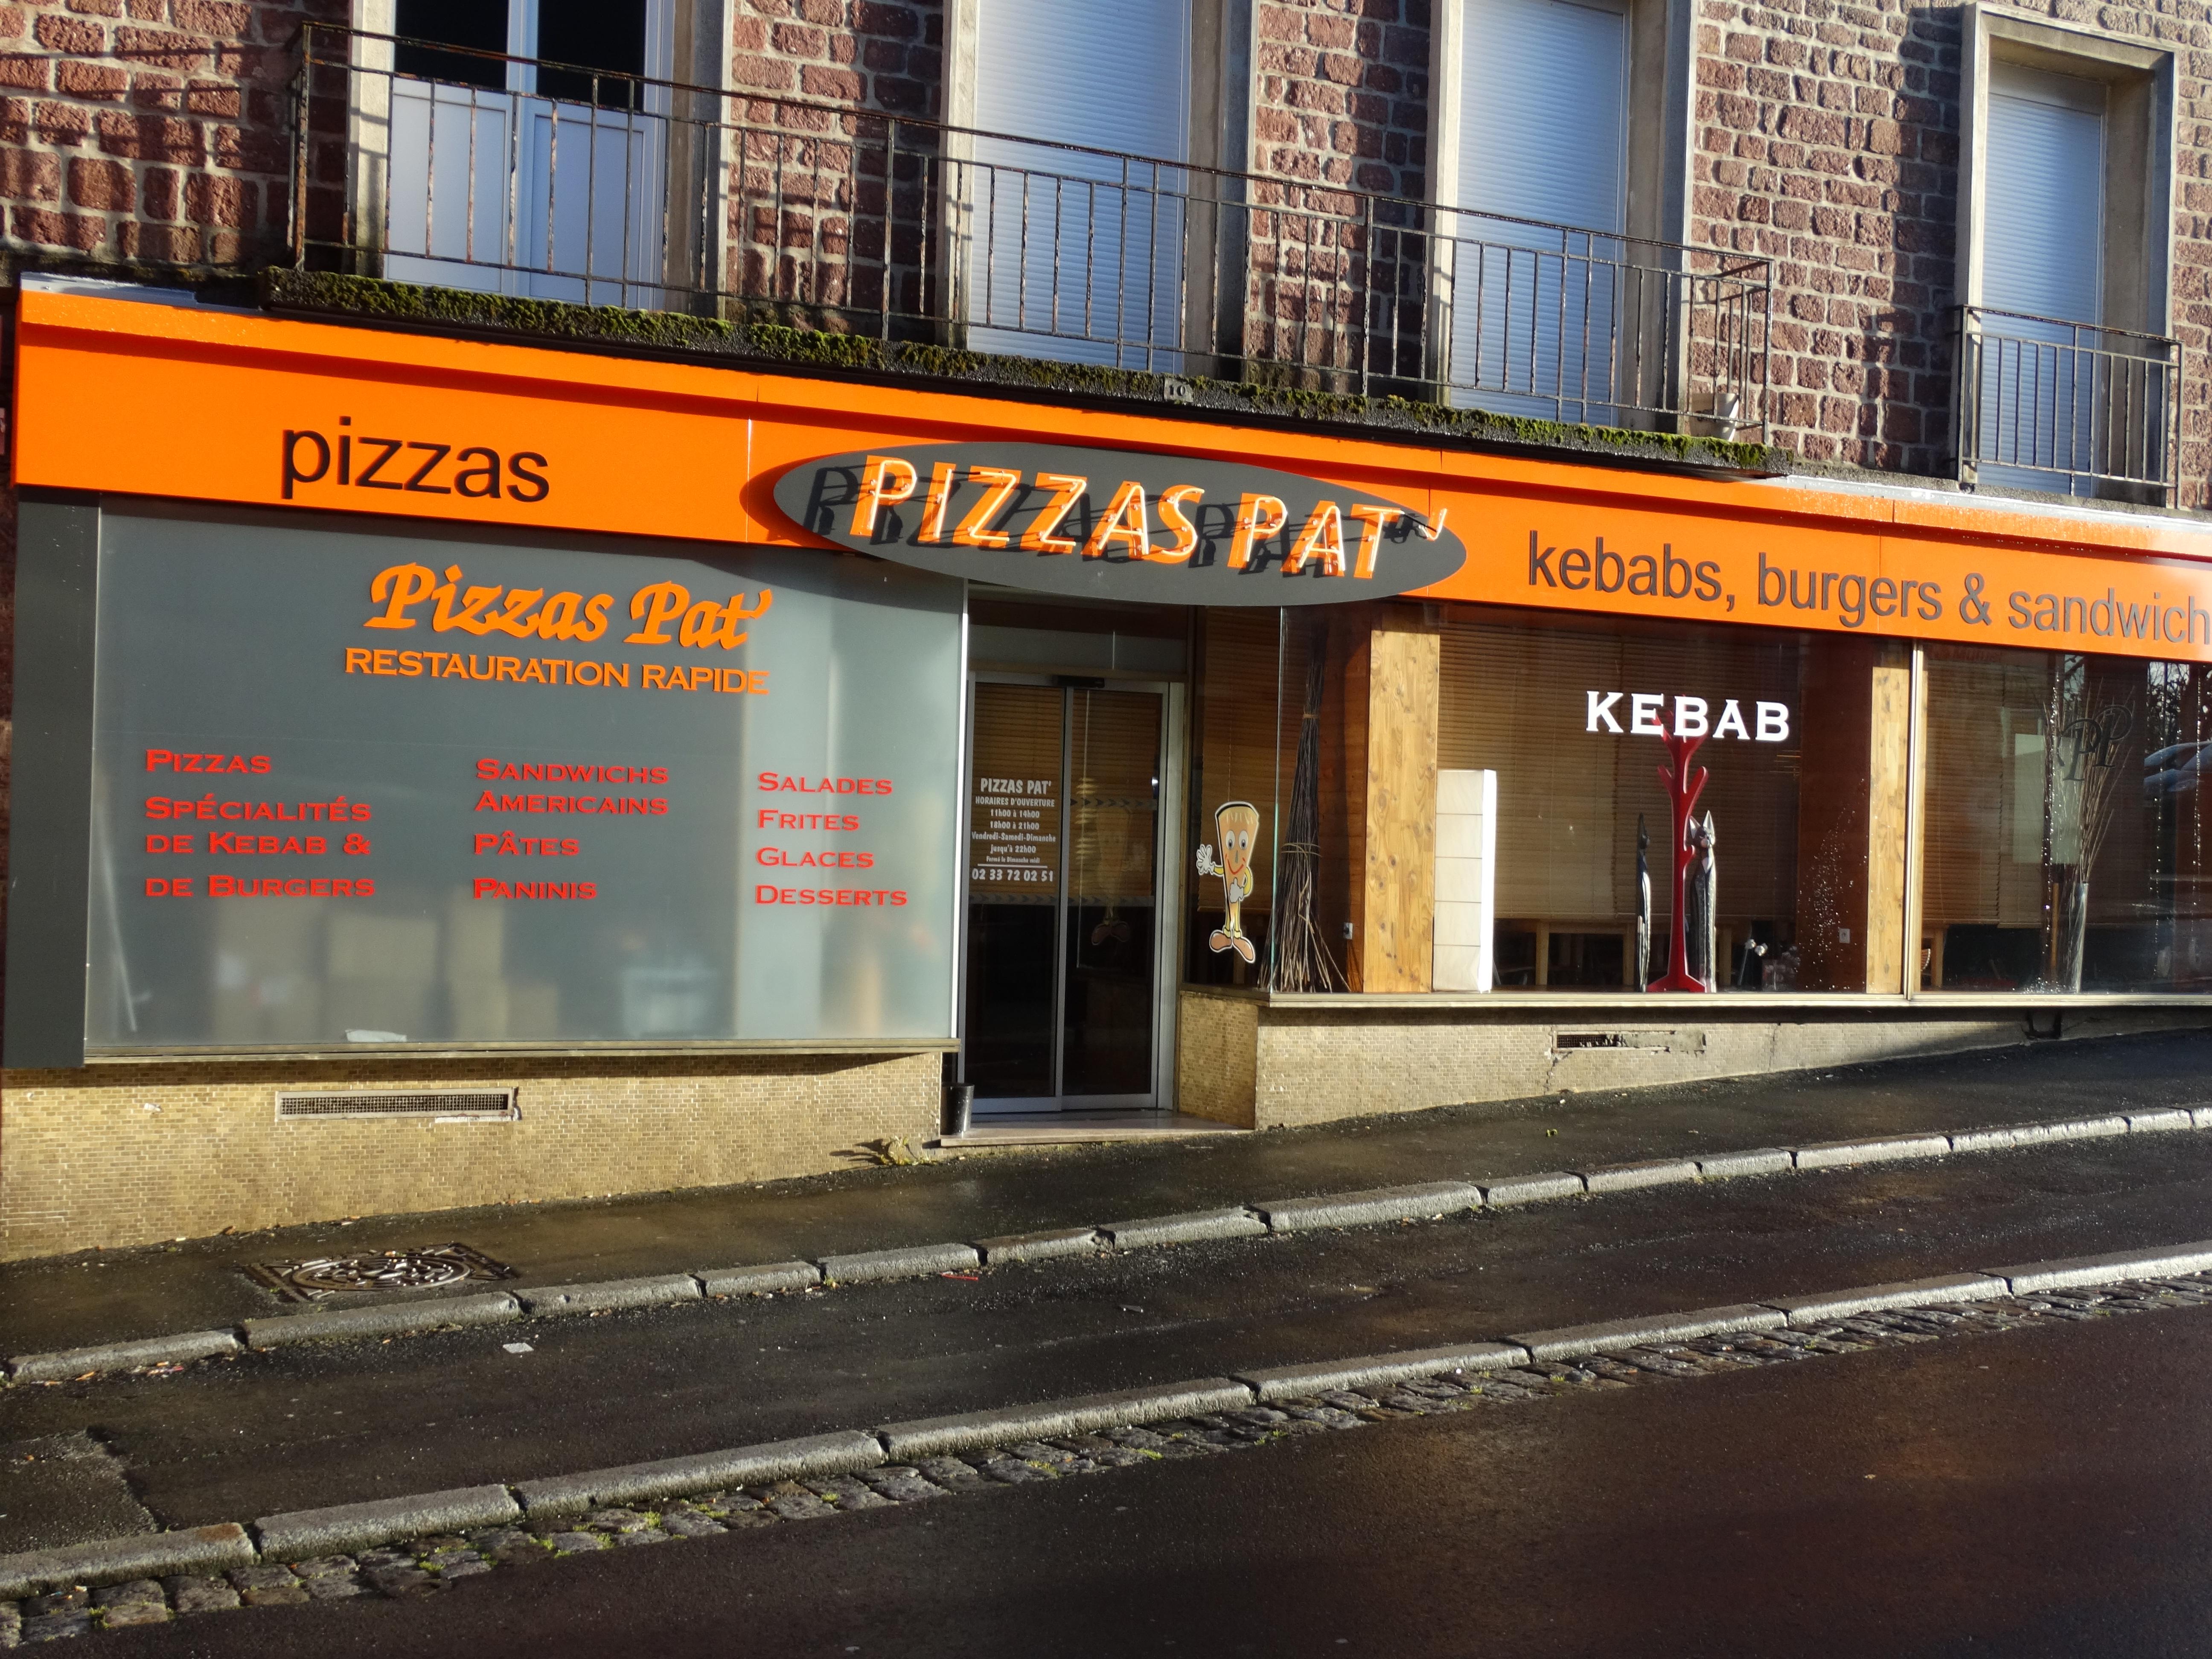 Pizzas pat'